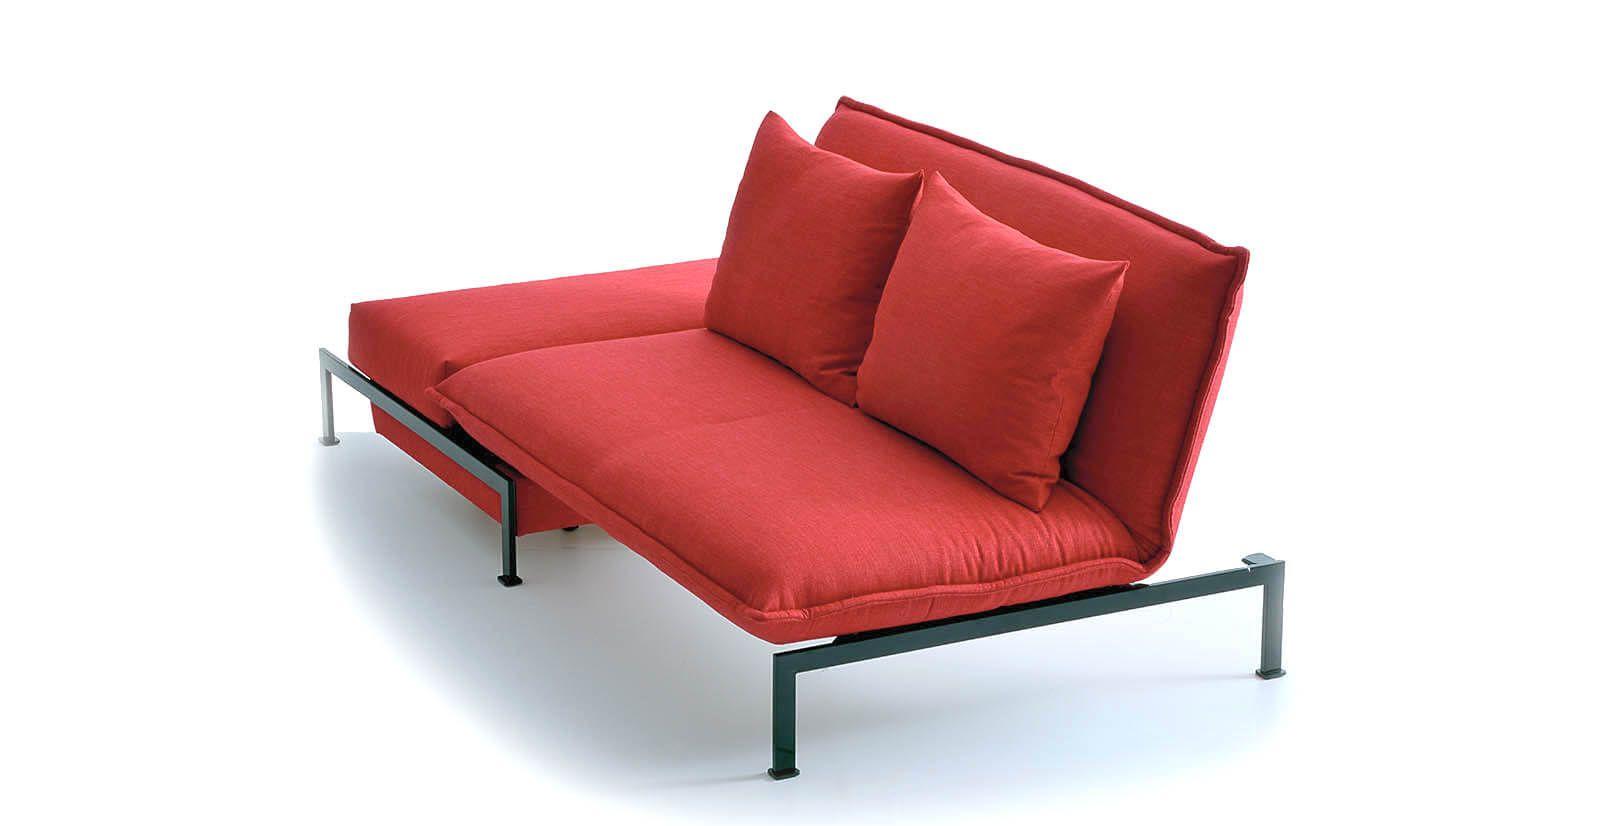 schlafsofa fun von franz fertig schlafsofa. Black Bedroom Furniture Sets. Home Design Ideas